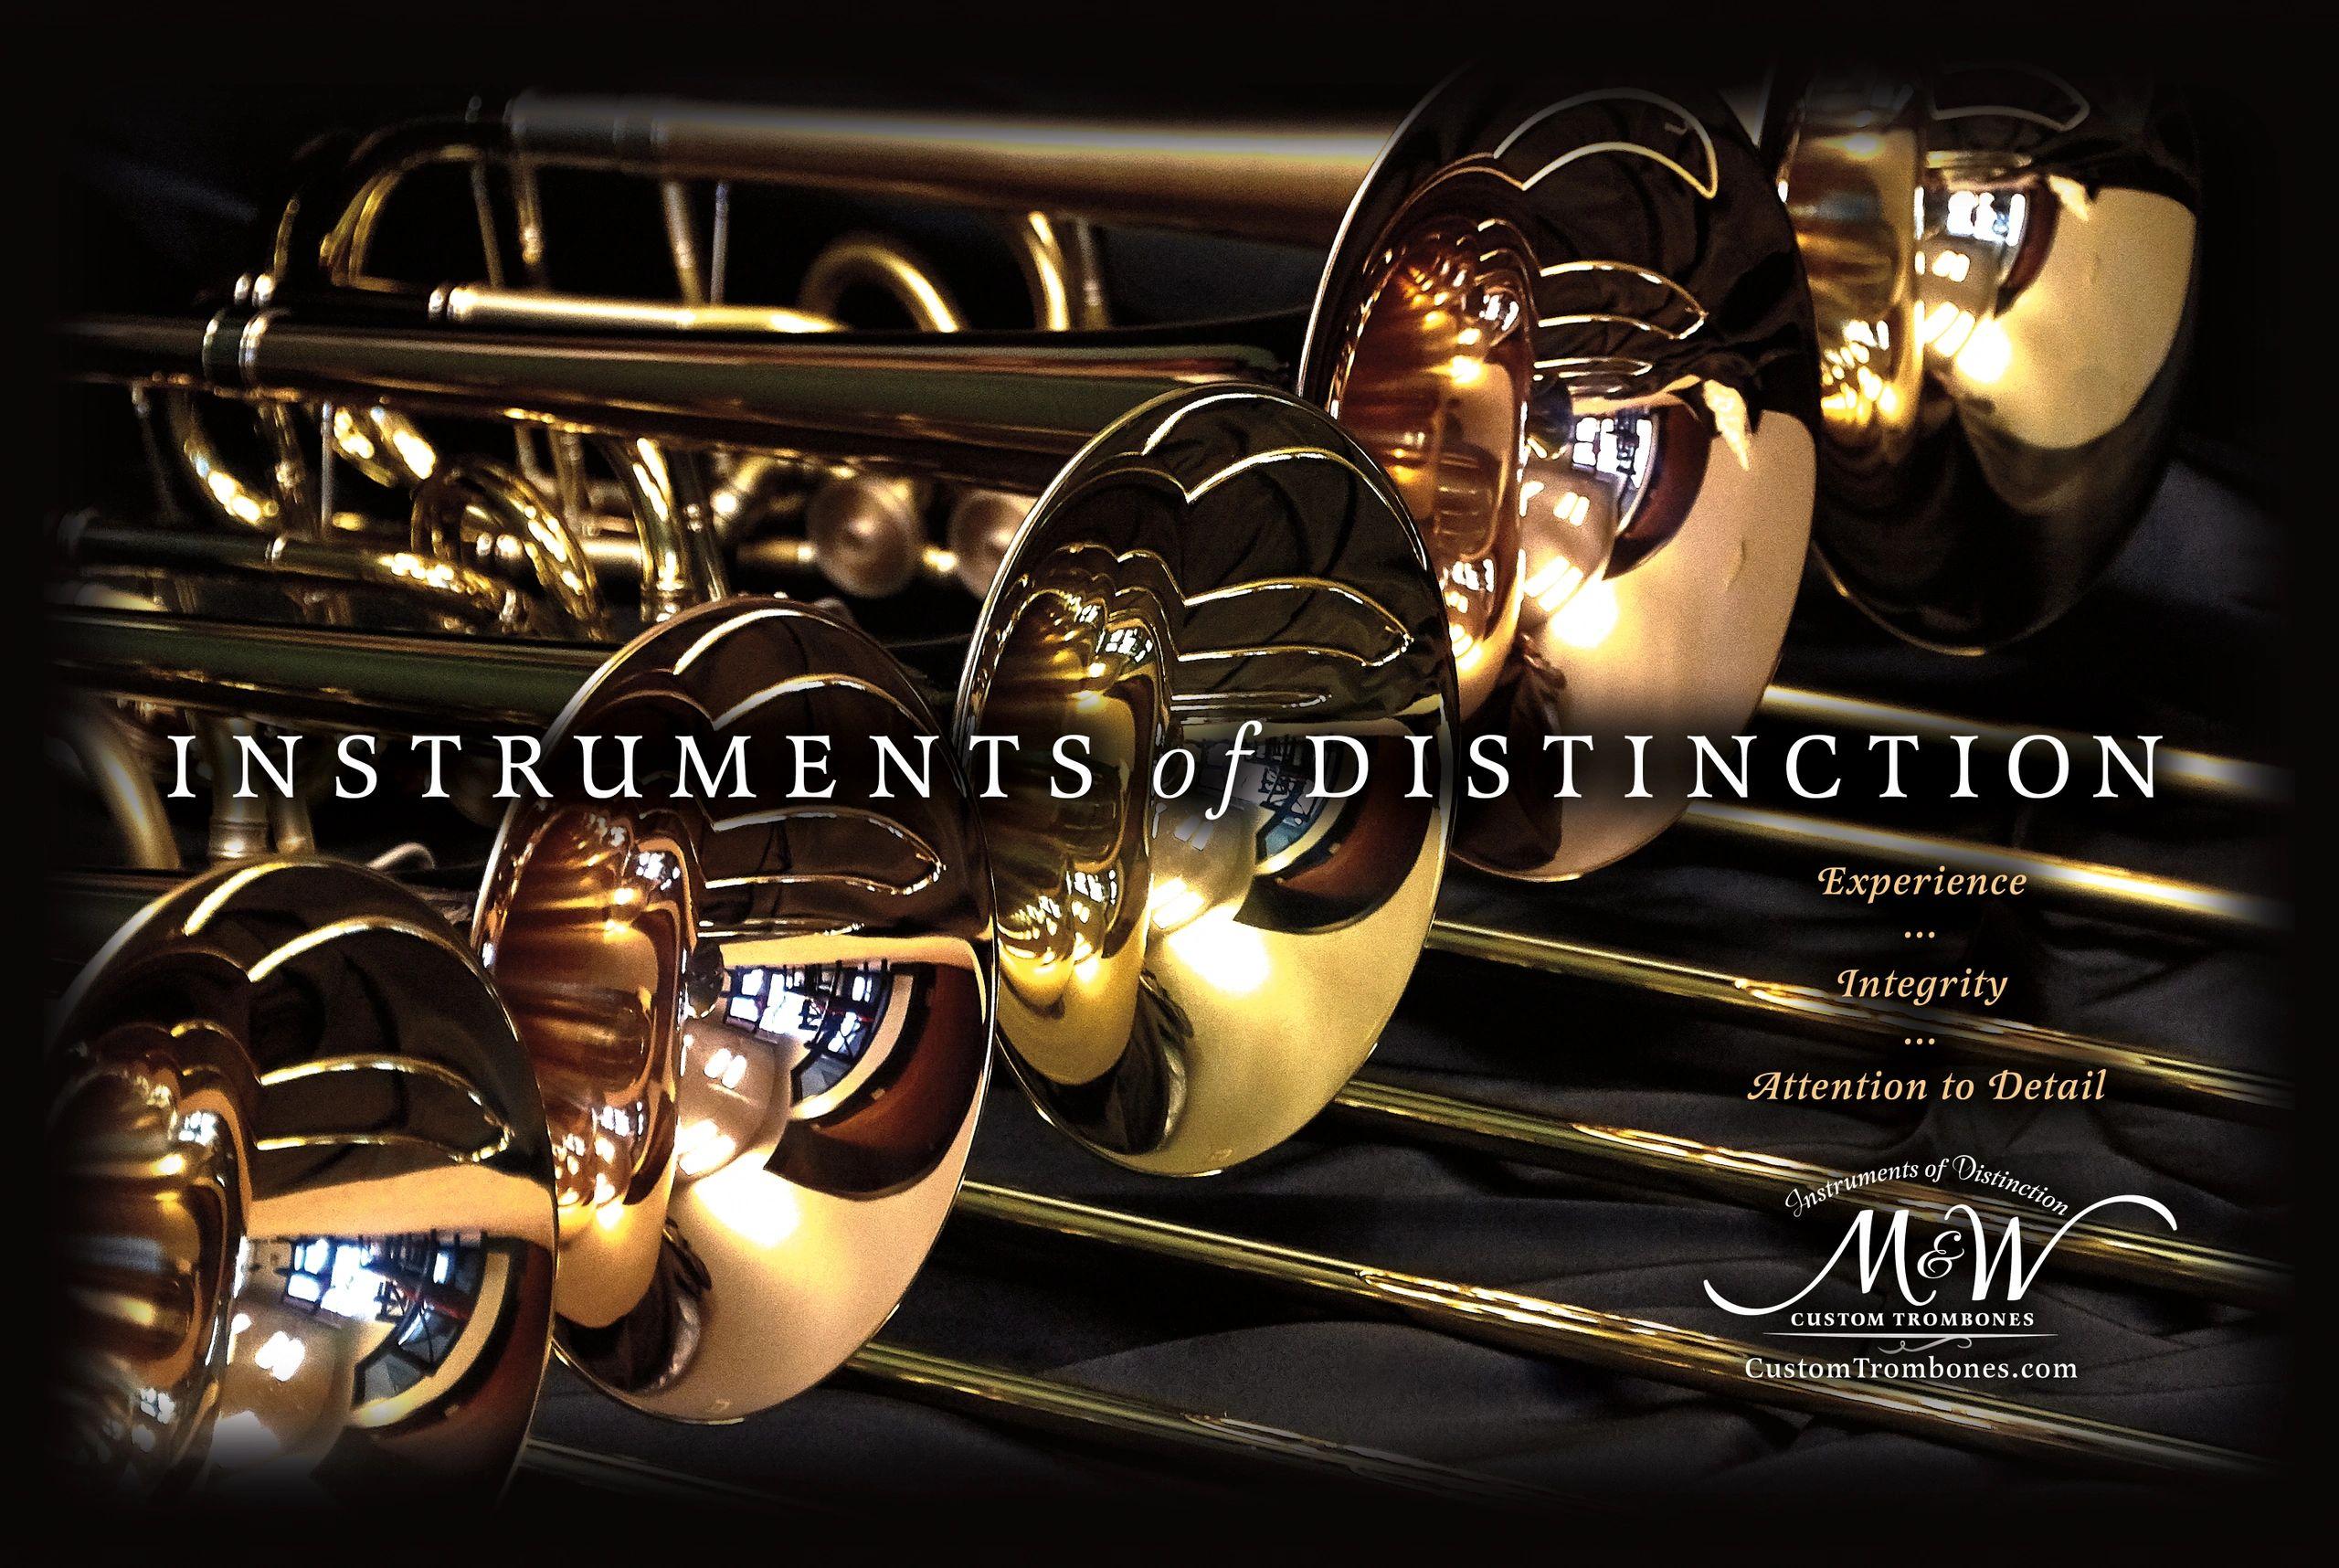 Our Products - M&W Custom Trombones | M&W Custom Trombones